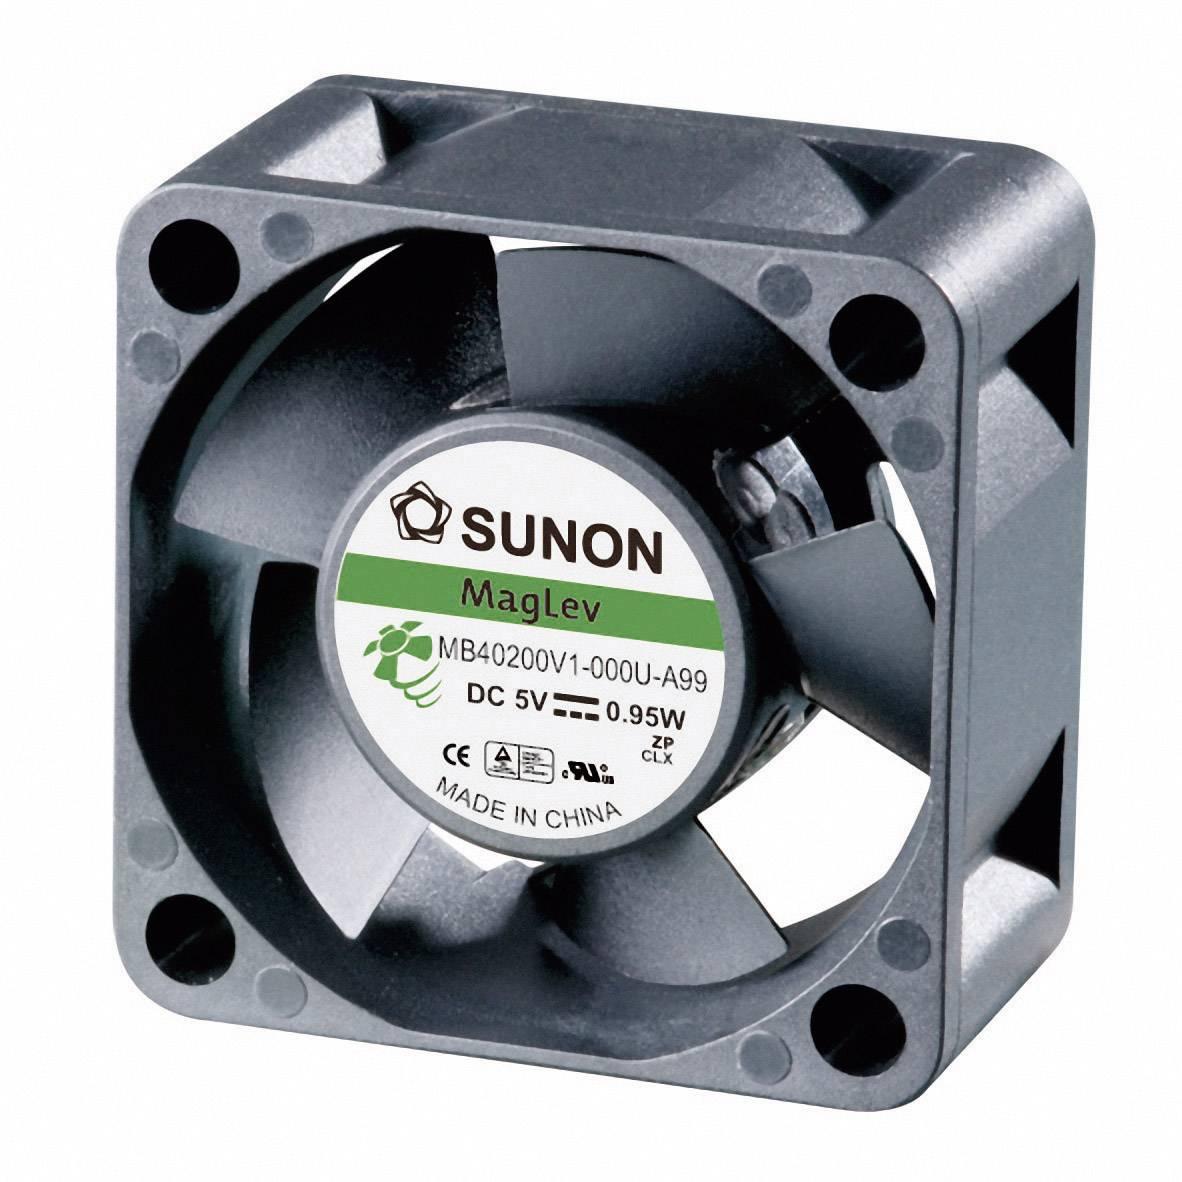 Ventilátor Sunon DR MB40201V3-0000-A99, 40 x 40 x 20 mm, 12 V/DC